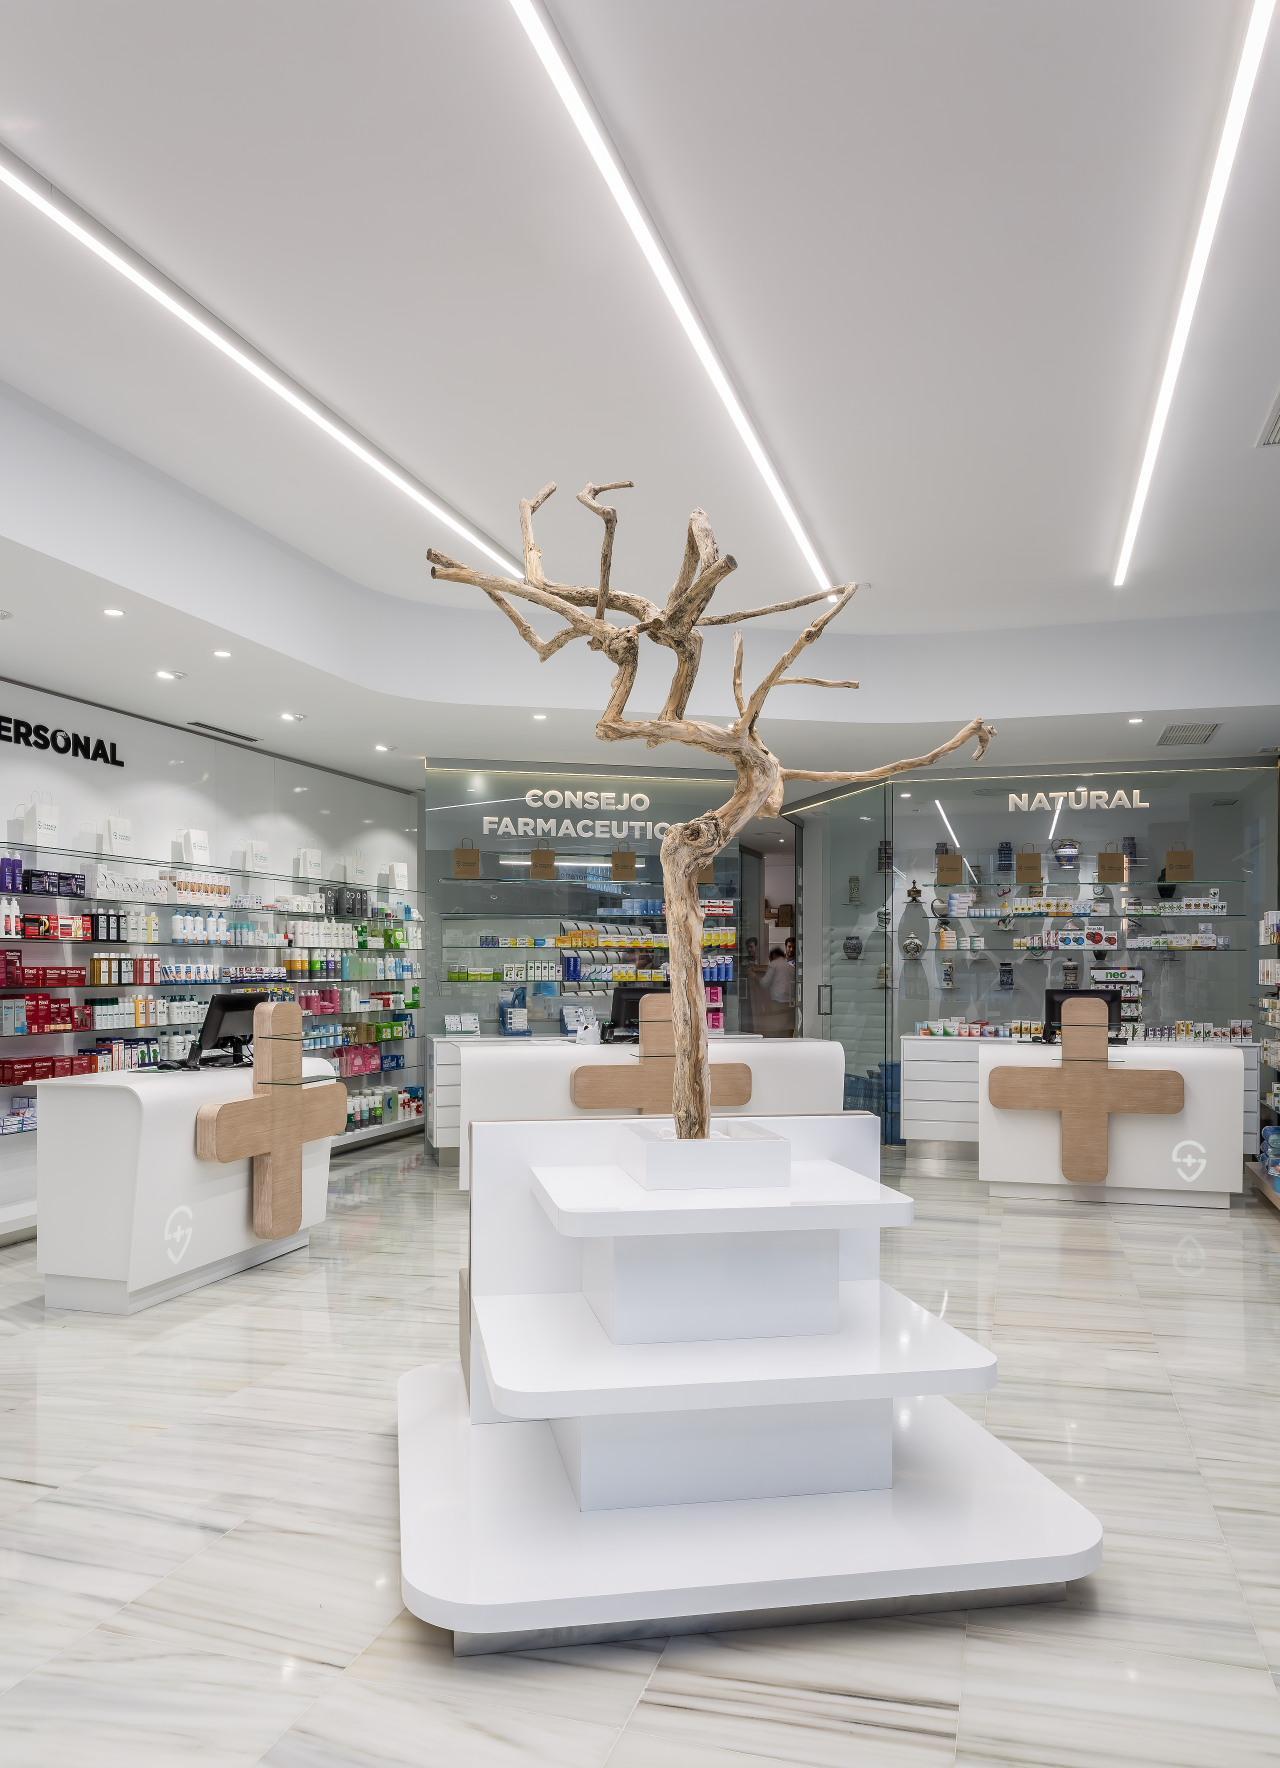 fotografia-arquitectura-valencia-german-cabo-d'estudio-farmacia-sanchis-ribarroja (13)